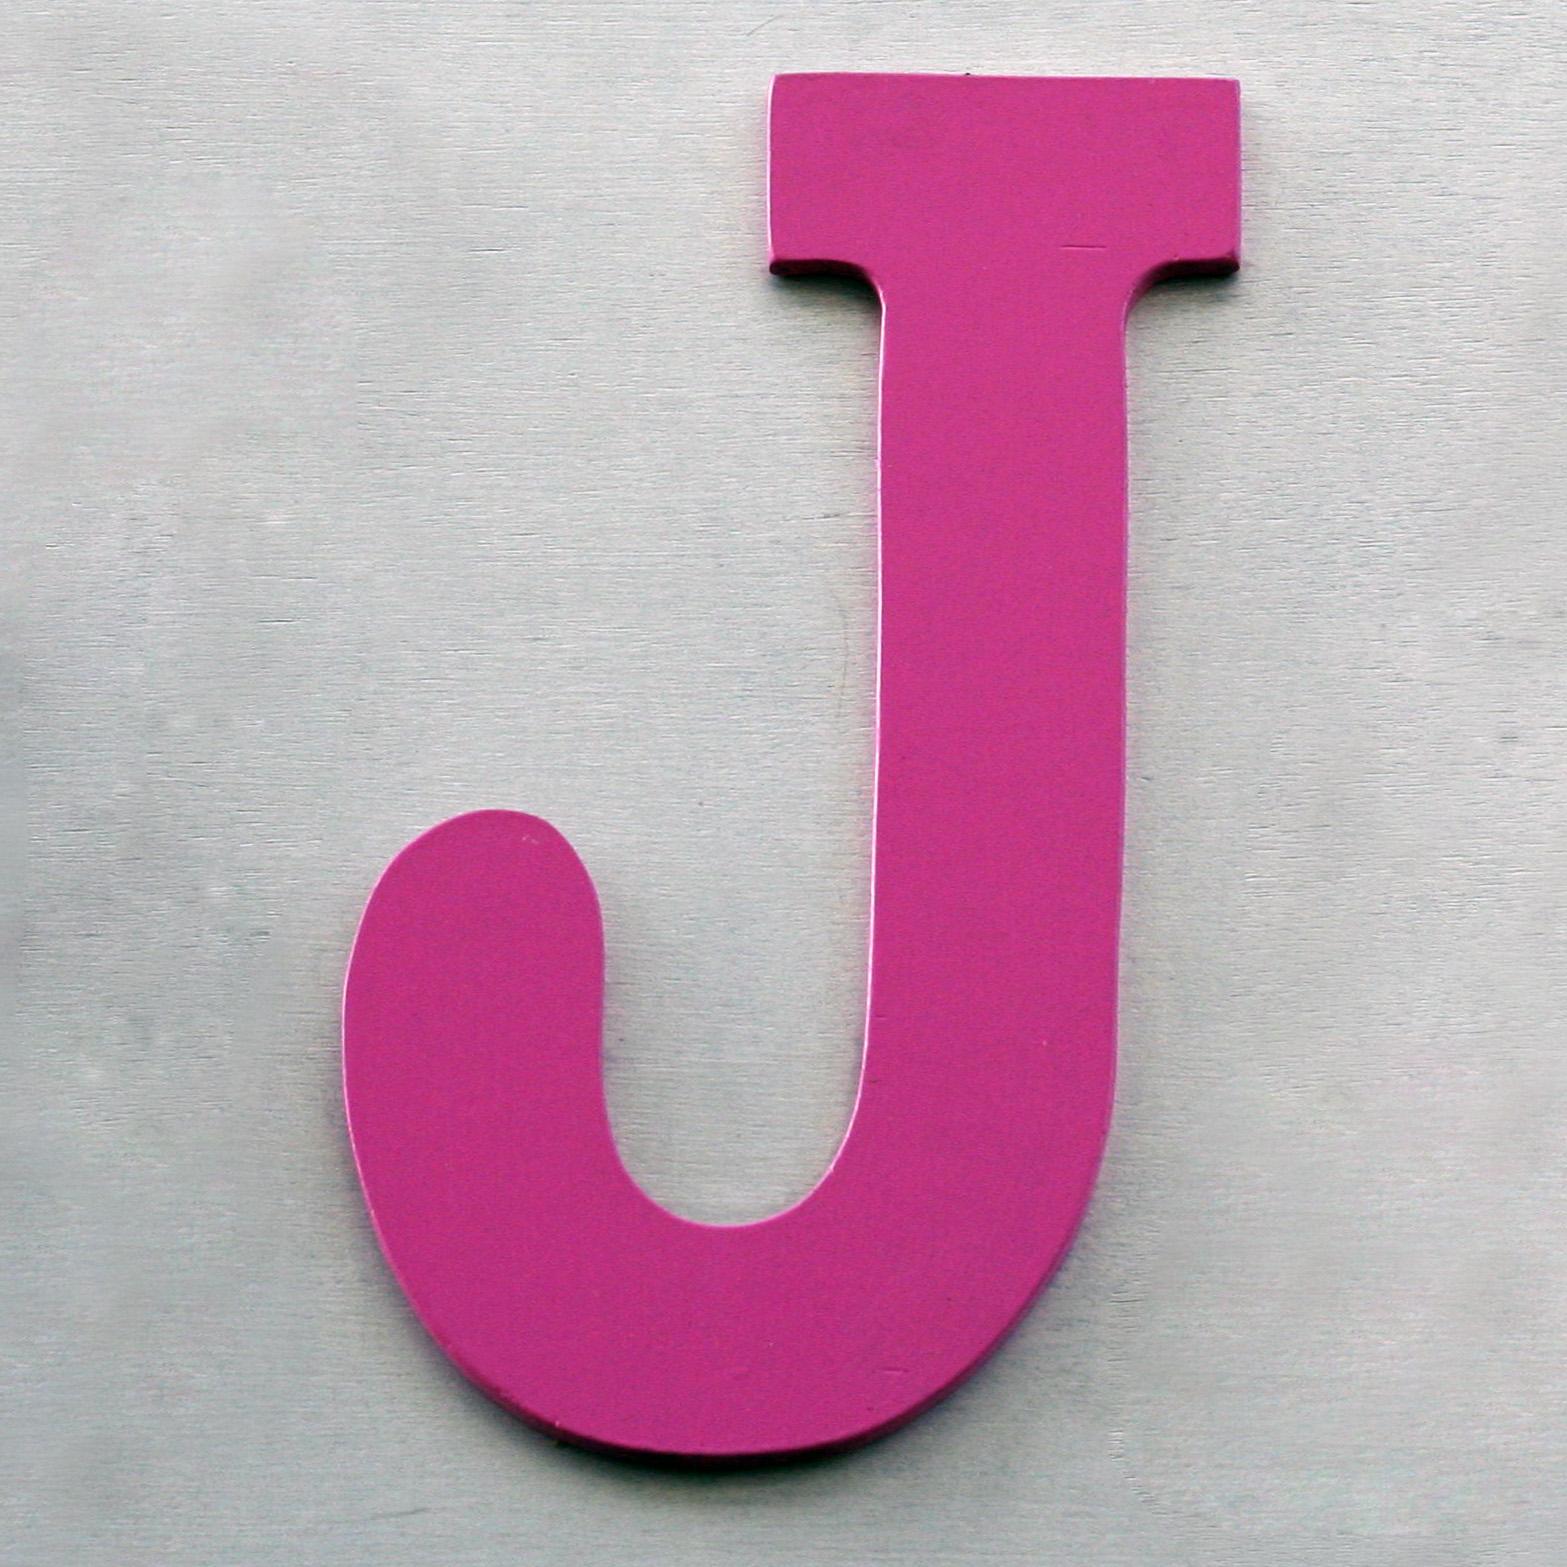 Galleries - Typography - One Letter - - Fubiz™